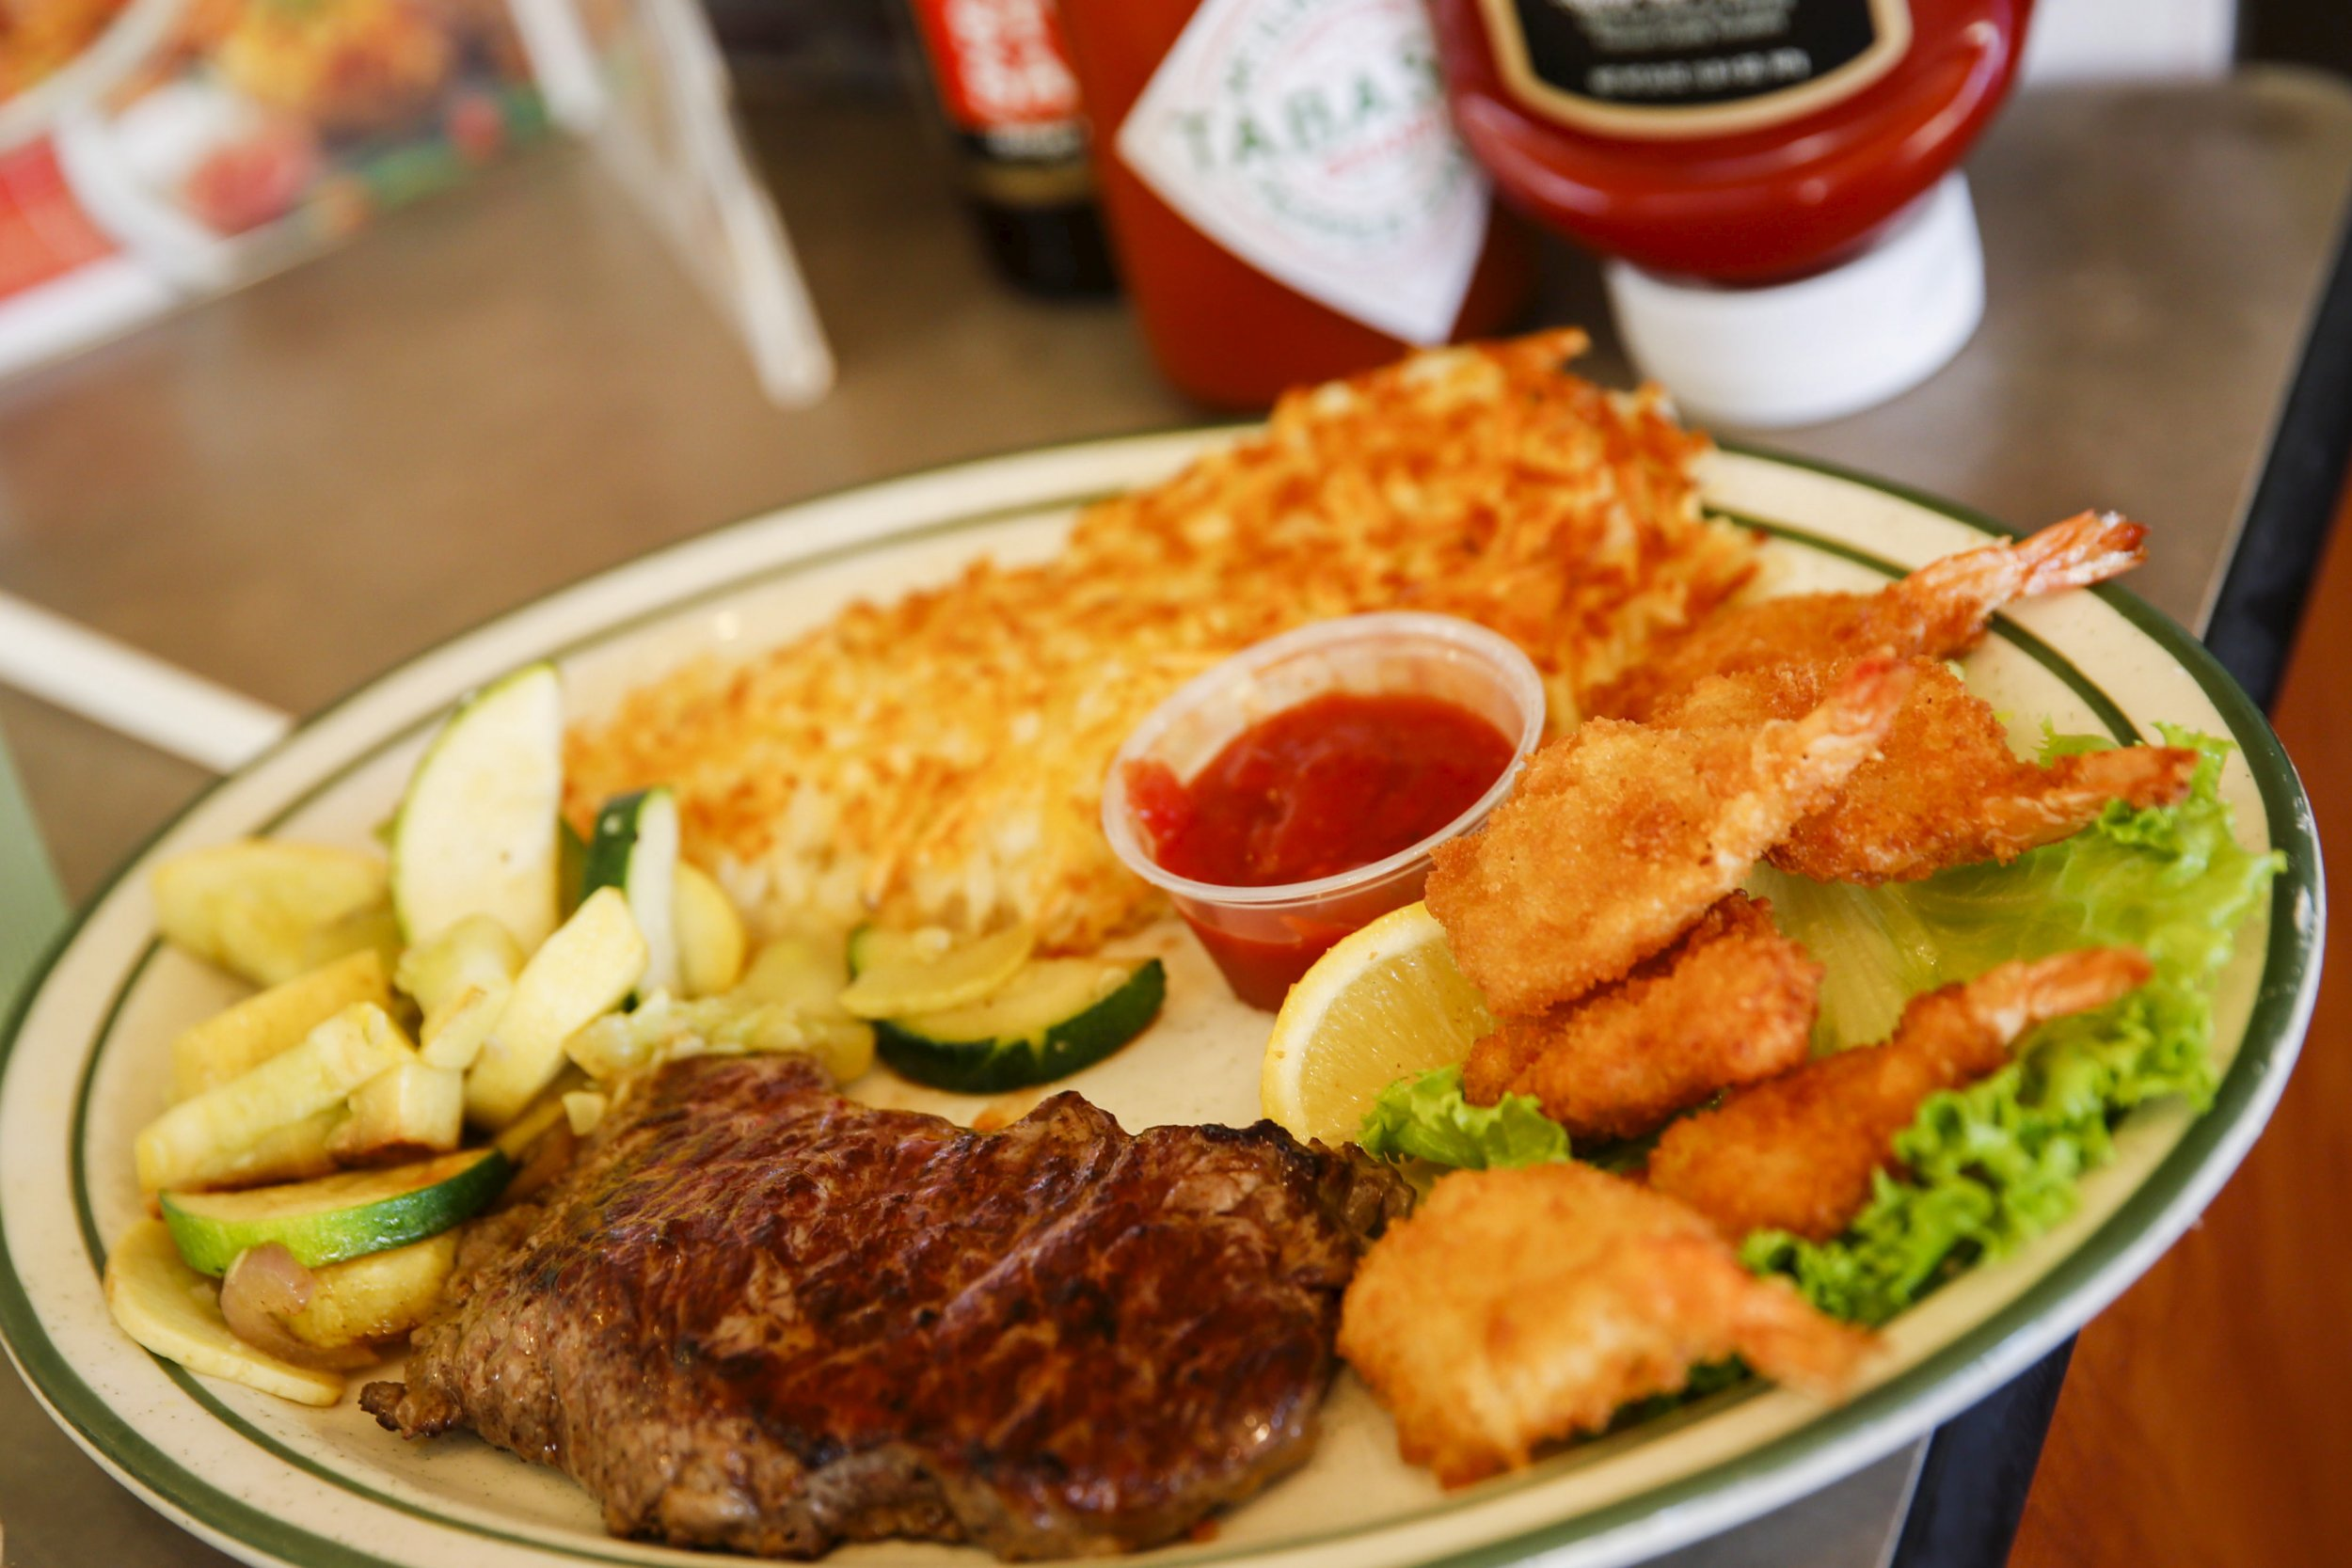 Non Chain Restaurants Also Serve Supersized High Calorie